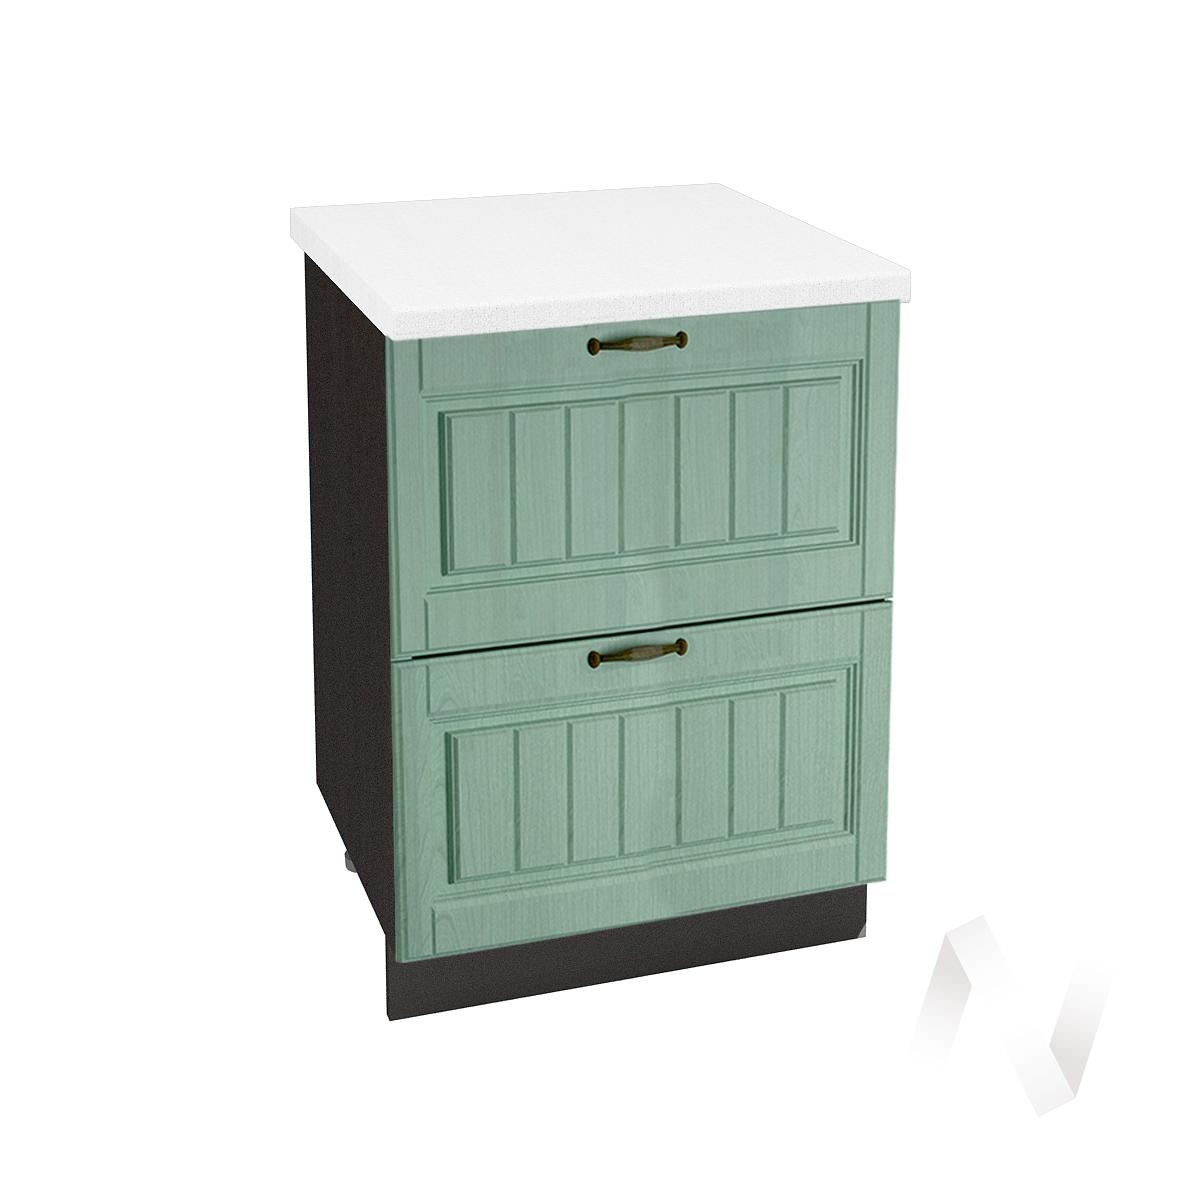 "Кухня ""Прованс"": Шкаф нижний с 2-мя ящиками 600, ШН2Я 600 (корпус венге)"